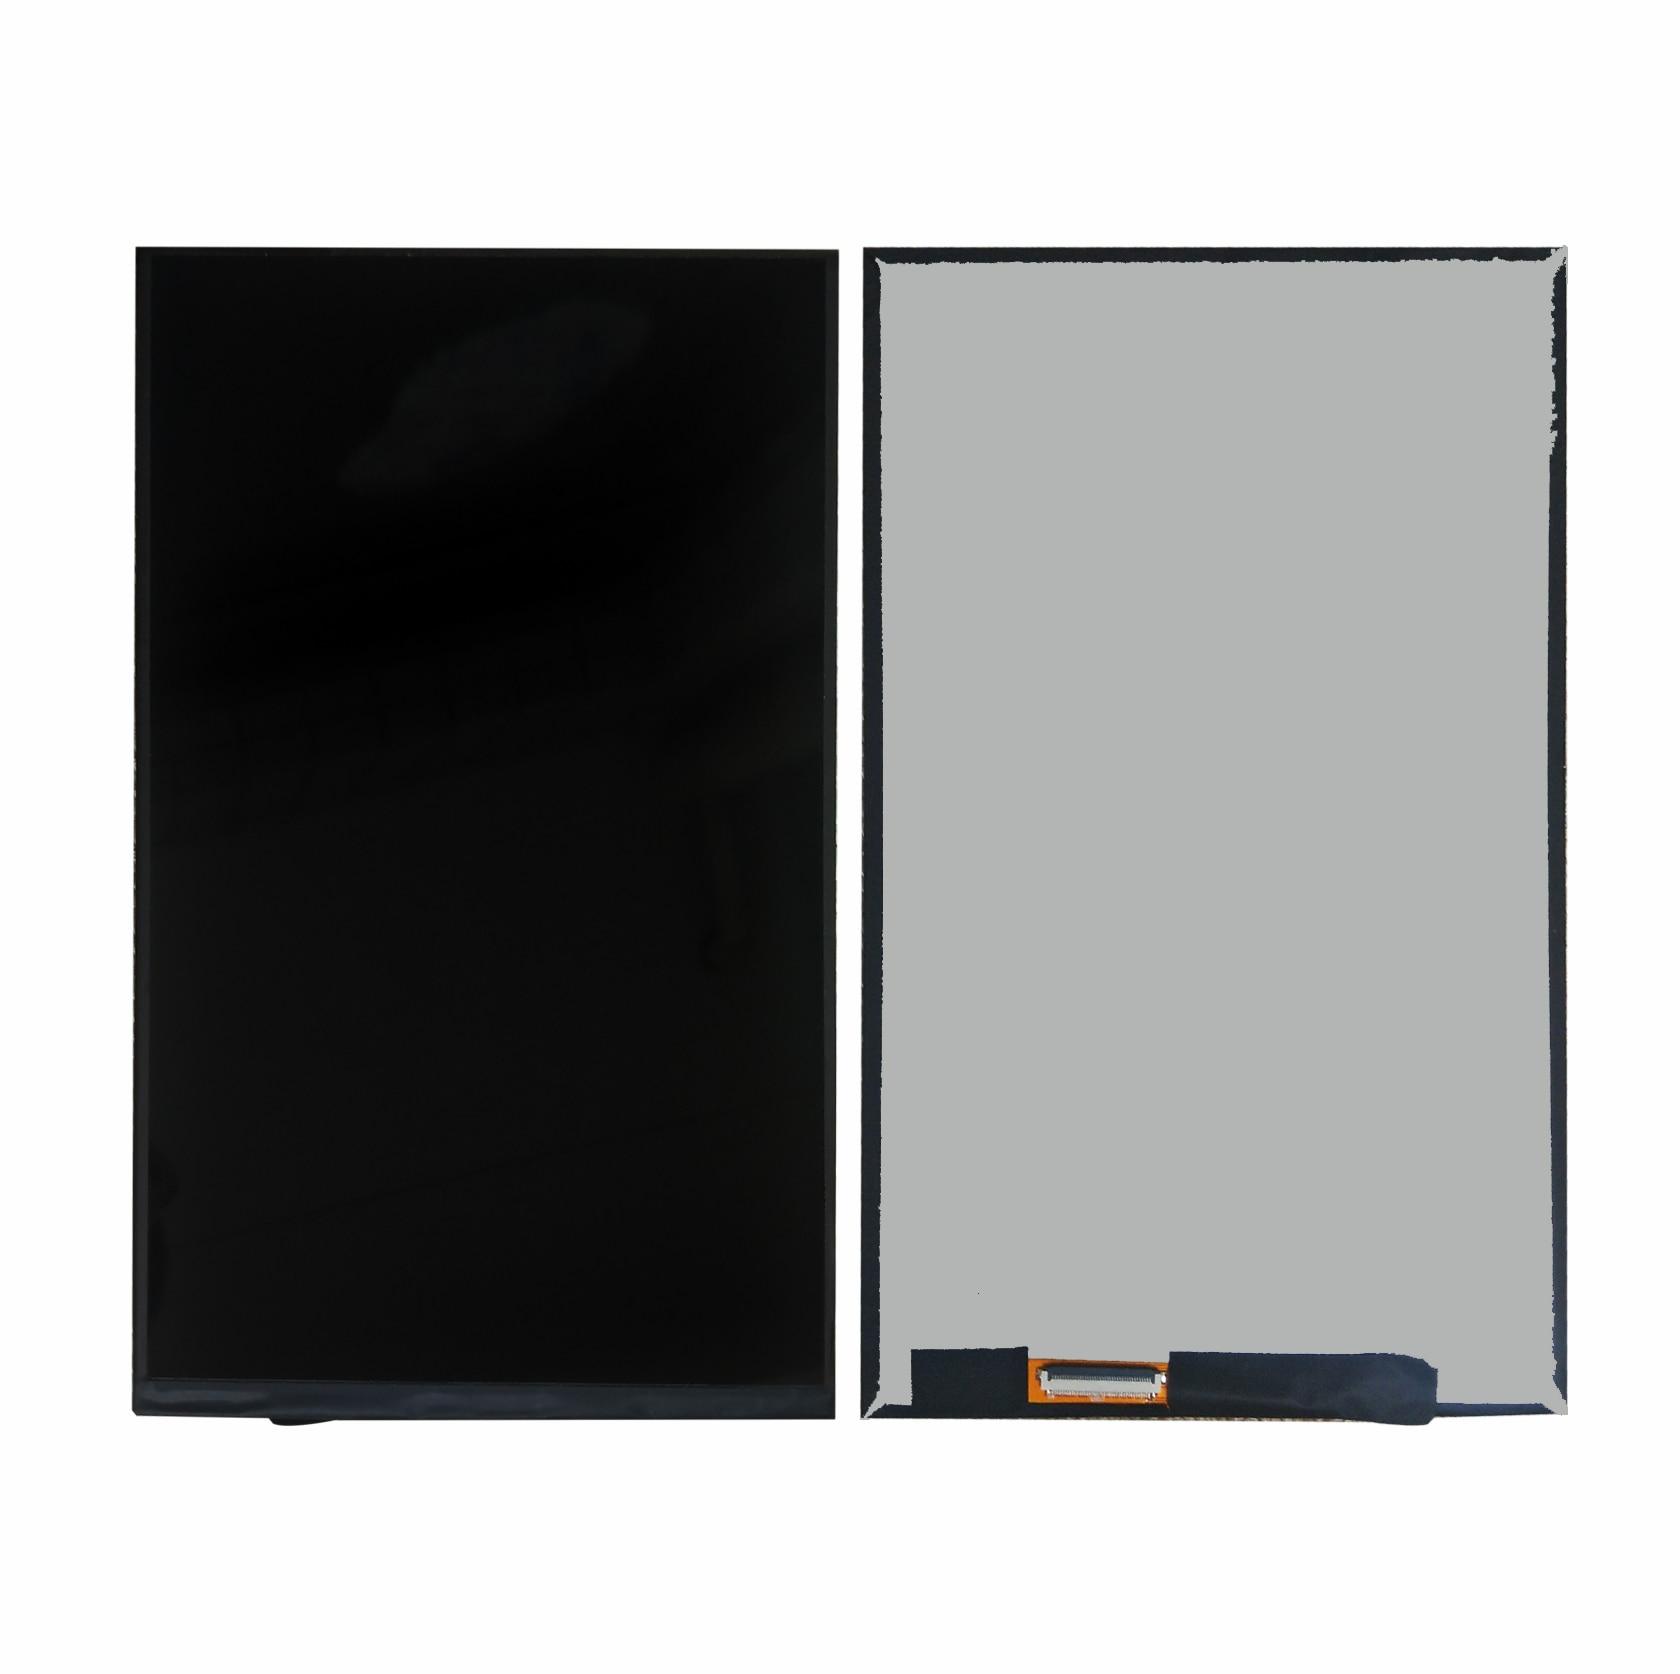 Novo 10.1 Polegada substituição 40pin ou 31pin display lcd tela para carbayta cp9 s119 tablet pc